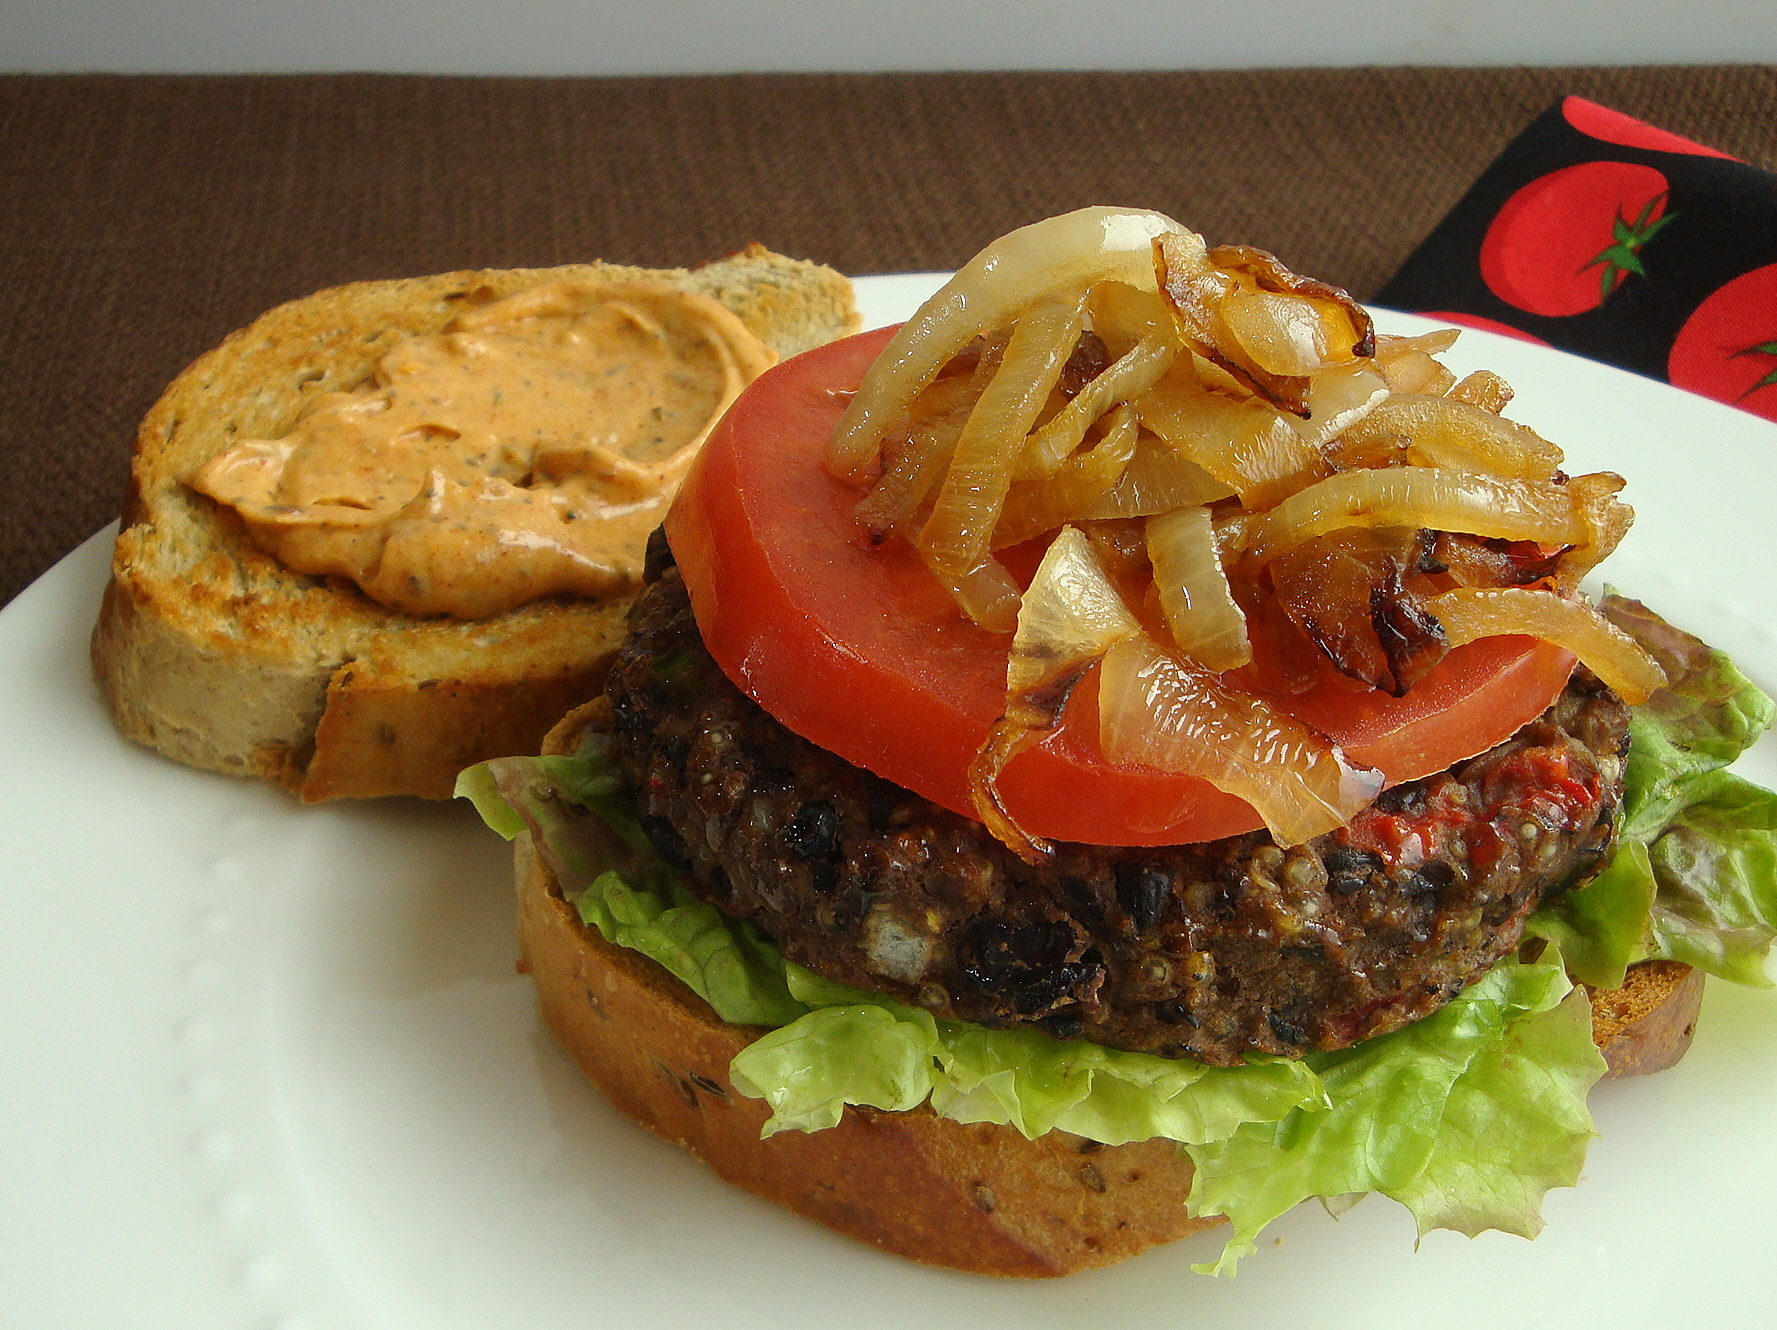 ... Baked black bean burgers, black bean burger recipe, vegetarian burgers